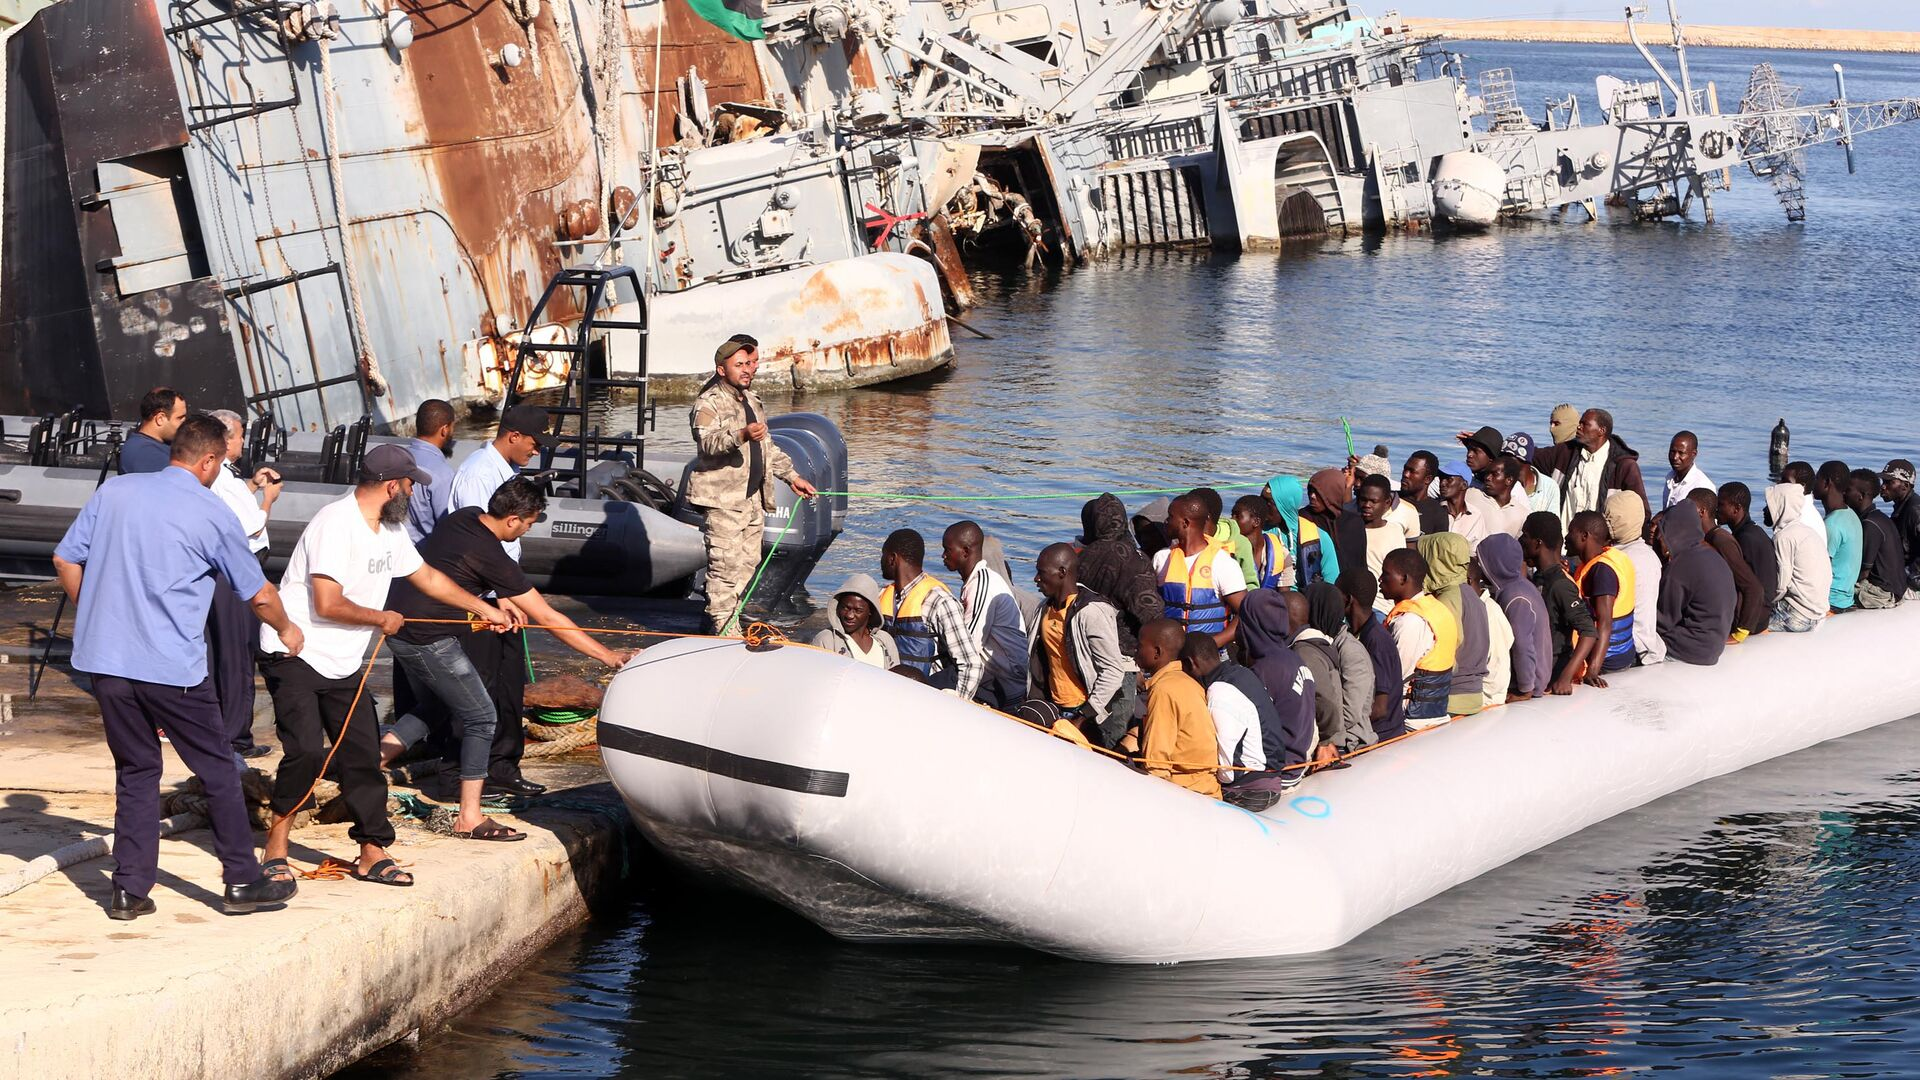 Migranti africani in Libia - Sputnik Italia, 1920, 01.06.2021